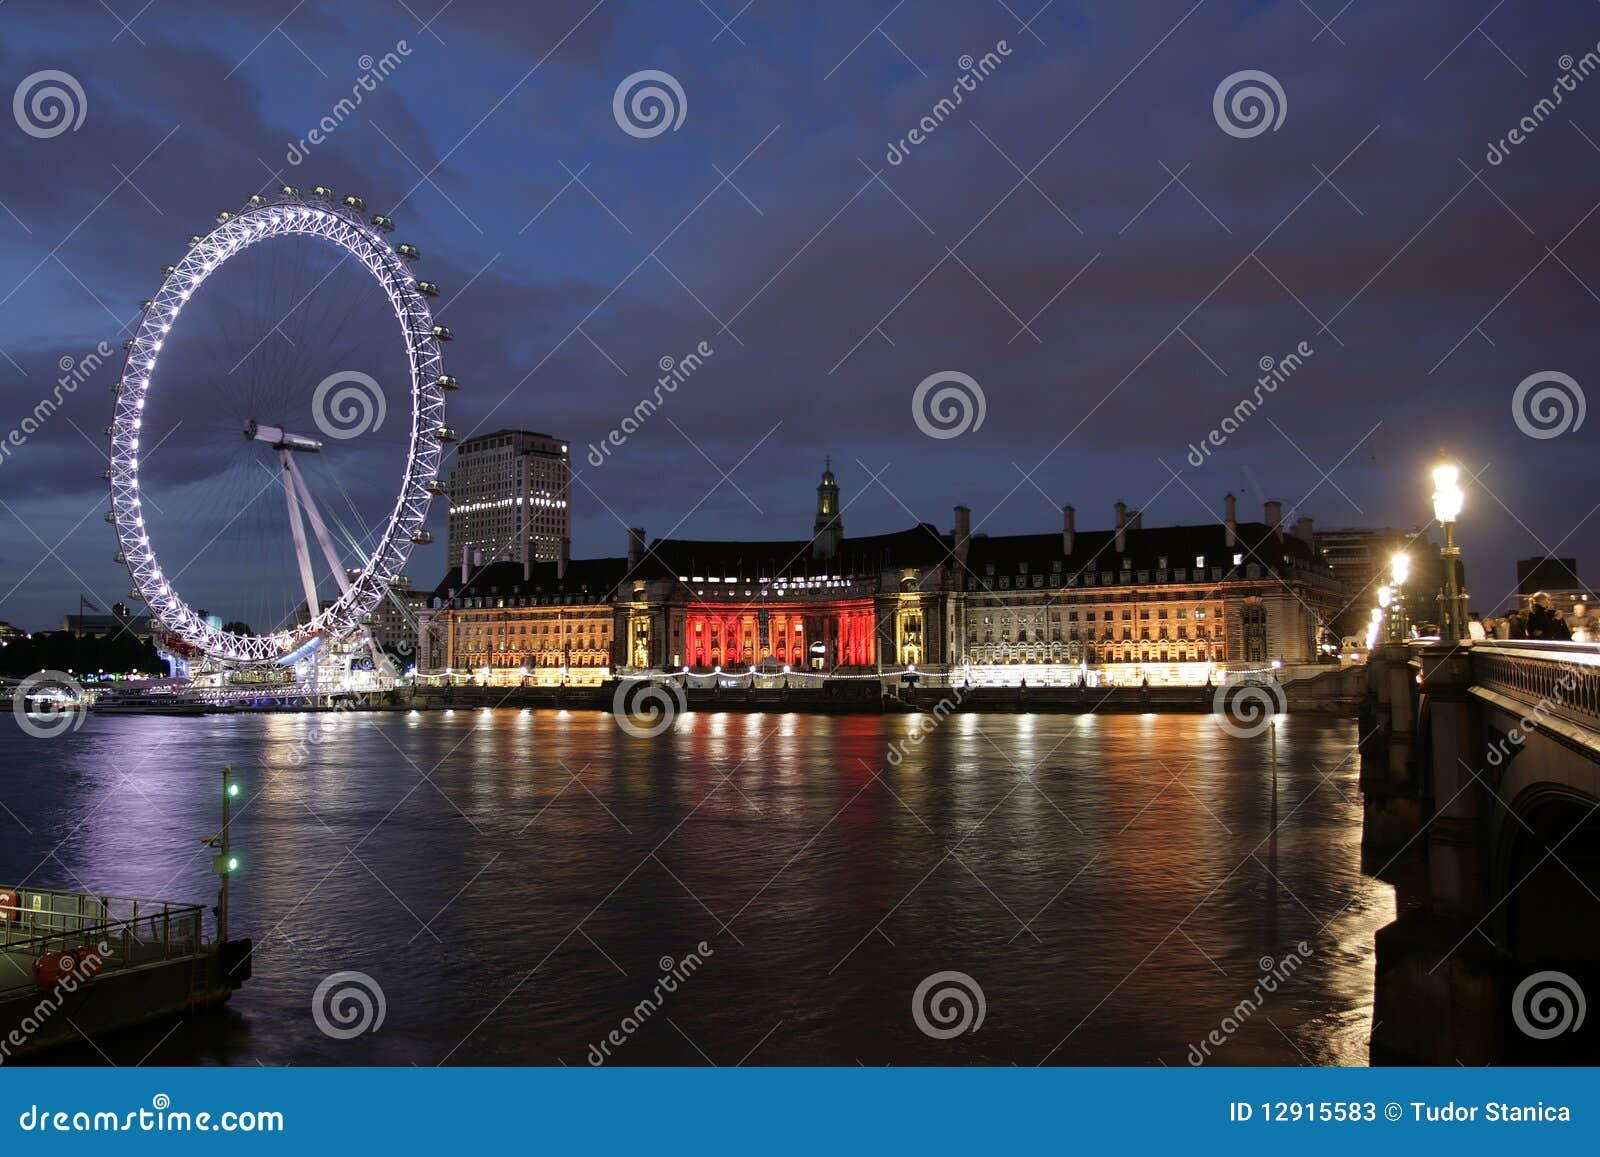 London Eye Nightview